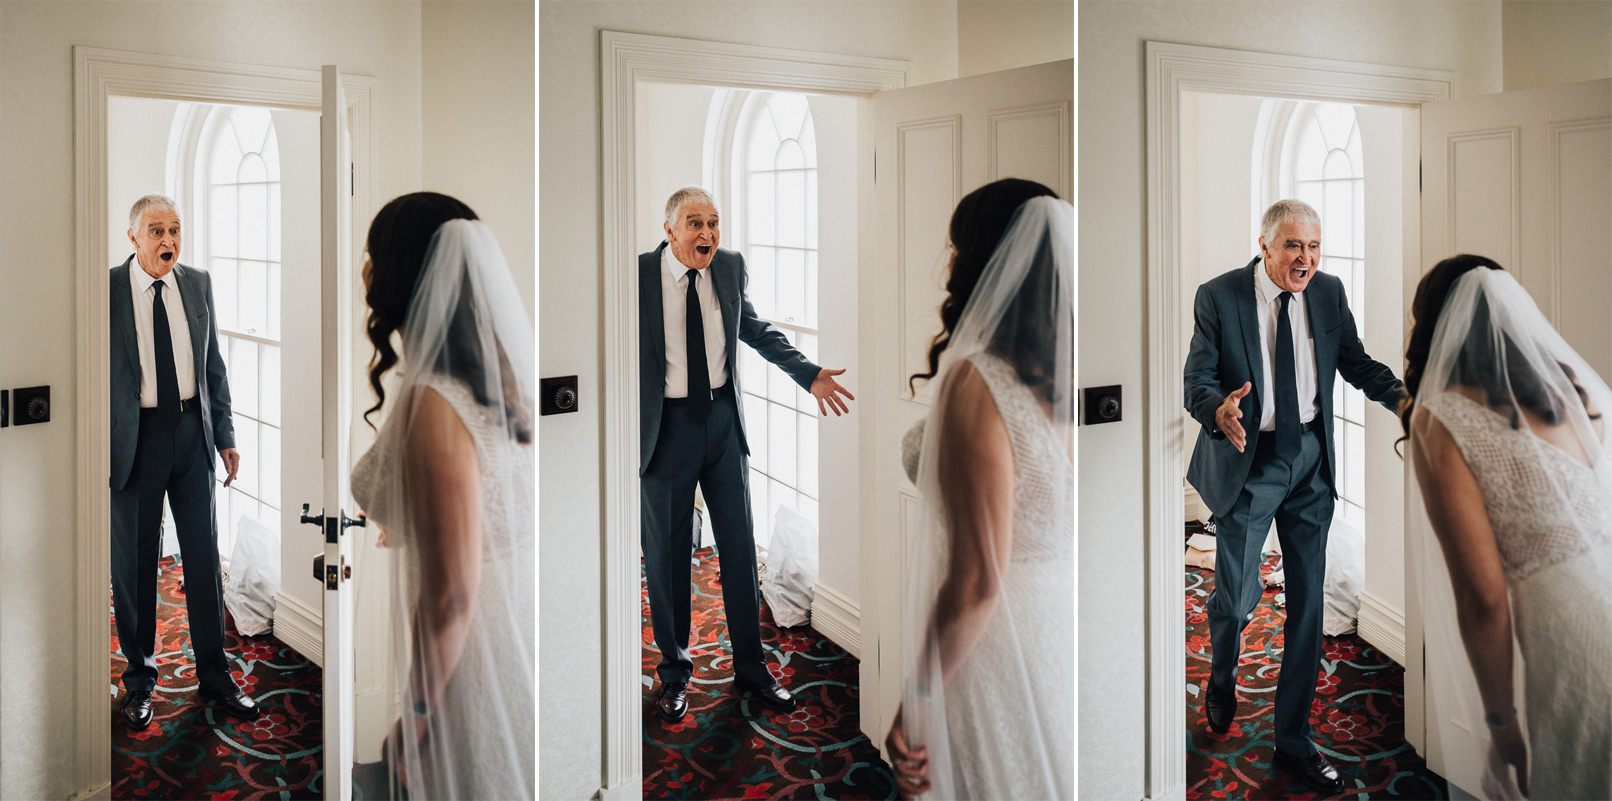 super-fun-bishops-house-wedding-33.jpg